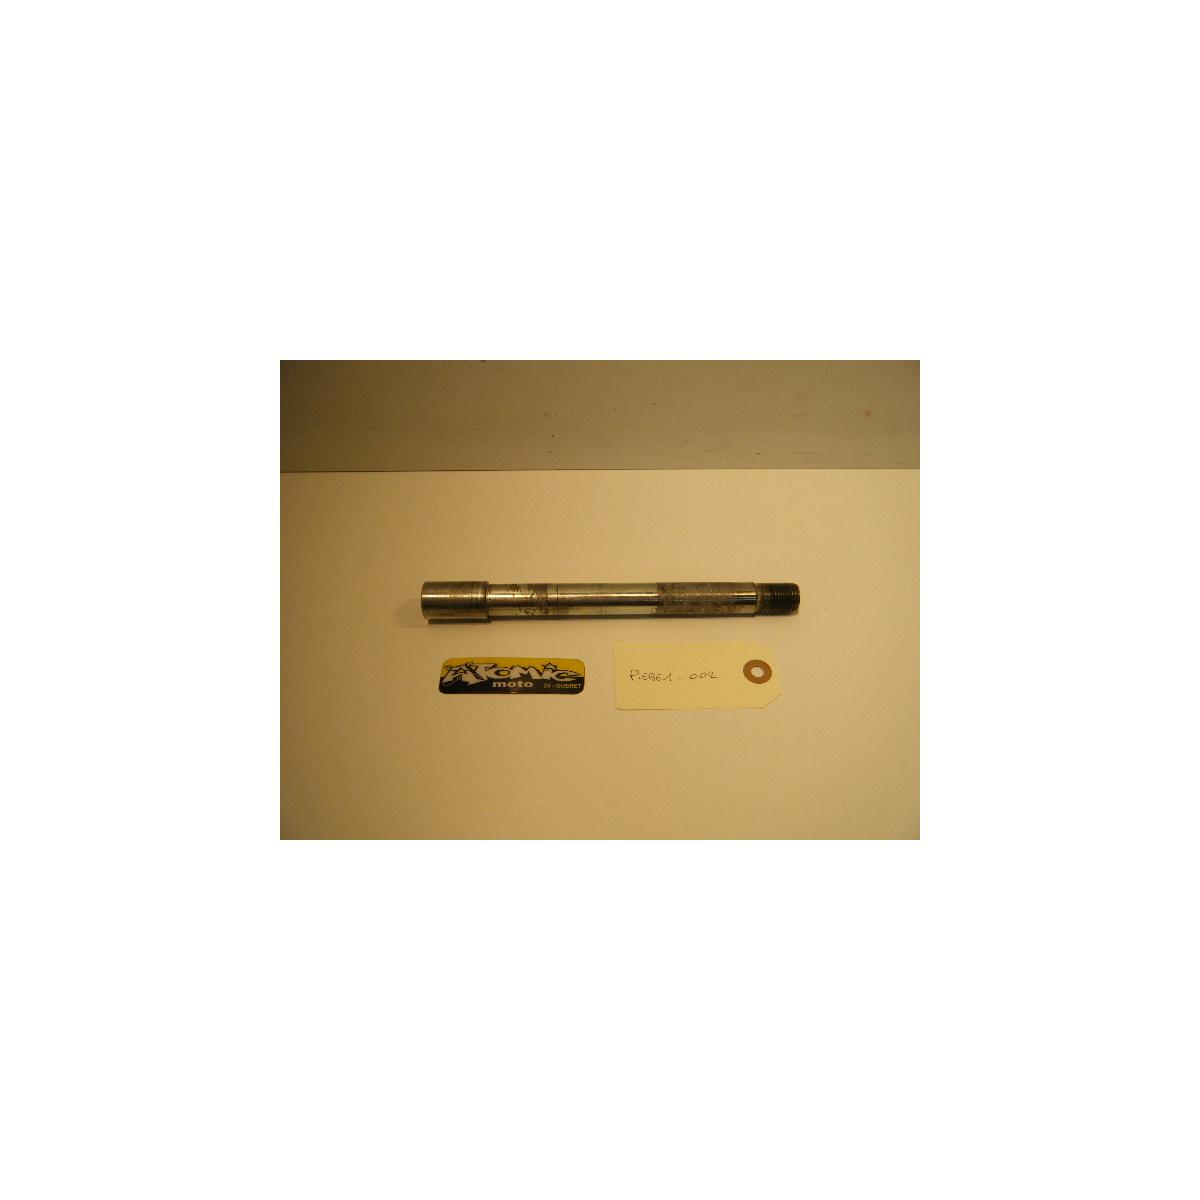 MAITRE CYLINDRE EMBRAYAGE HUSQVARNA 125 WRE 2004